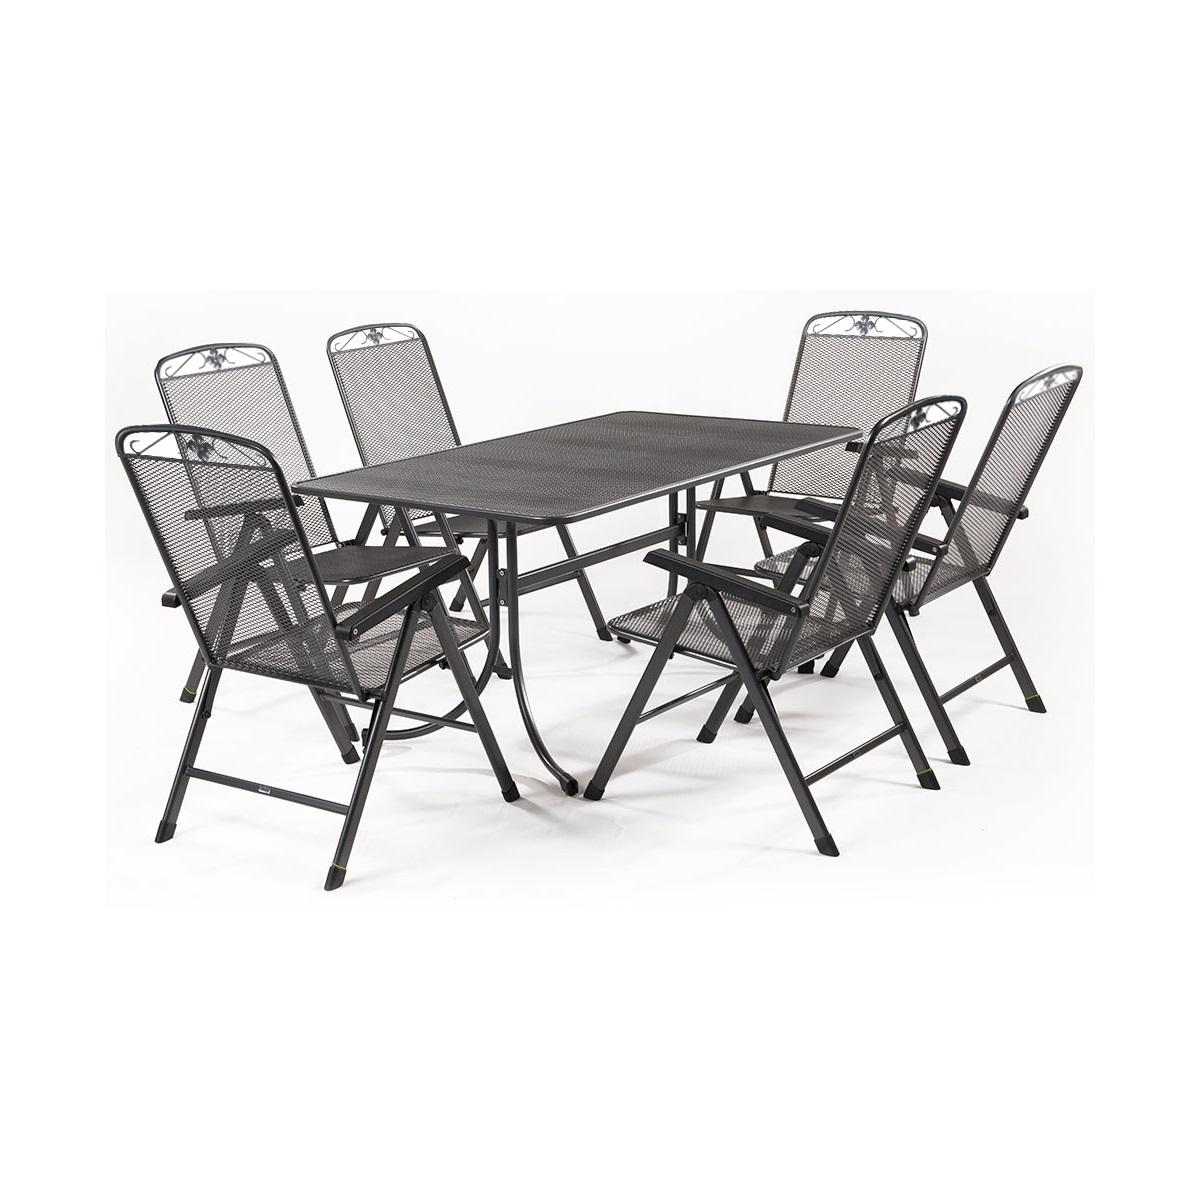 MWH Basanis 6+, sestava nábytku z tahokovu (6x pol. křeslo Savoy, 1x stůl Universal 160)